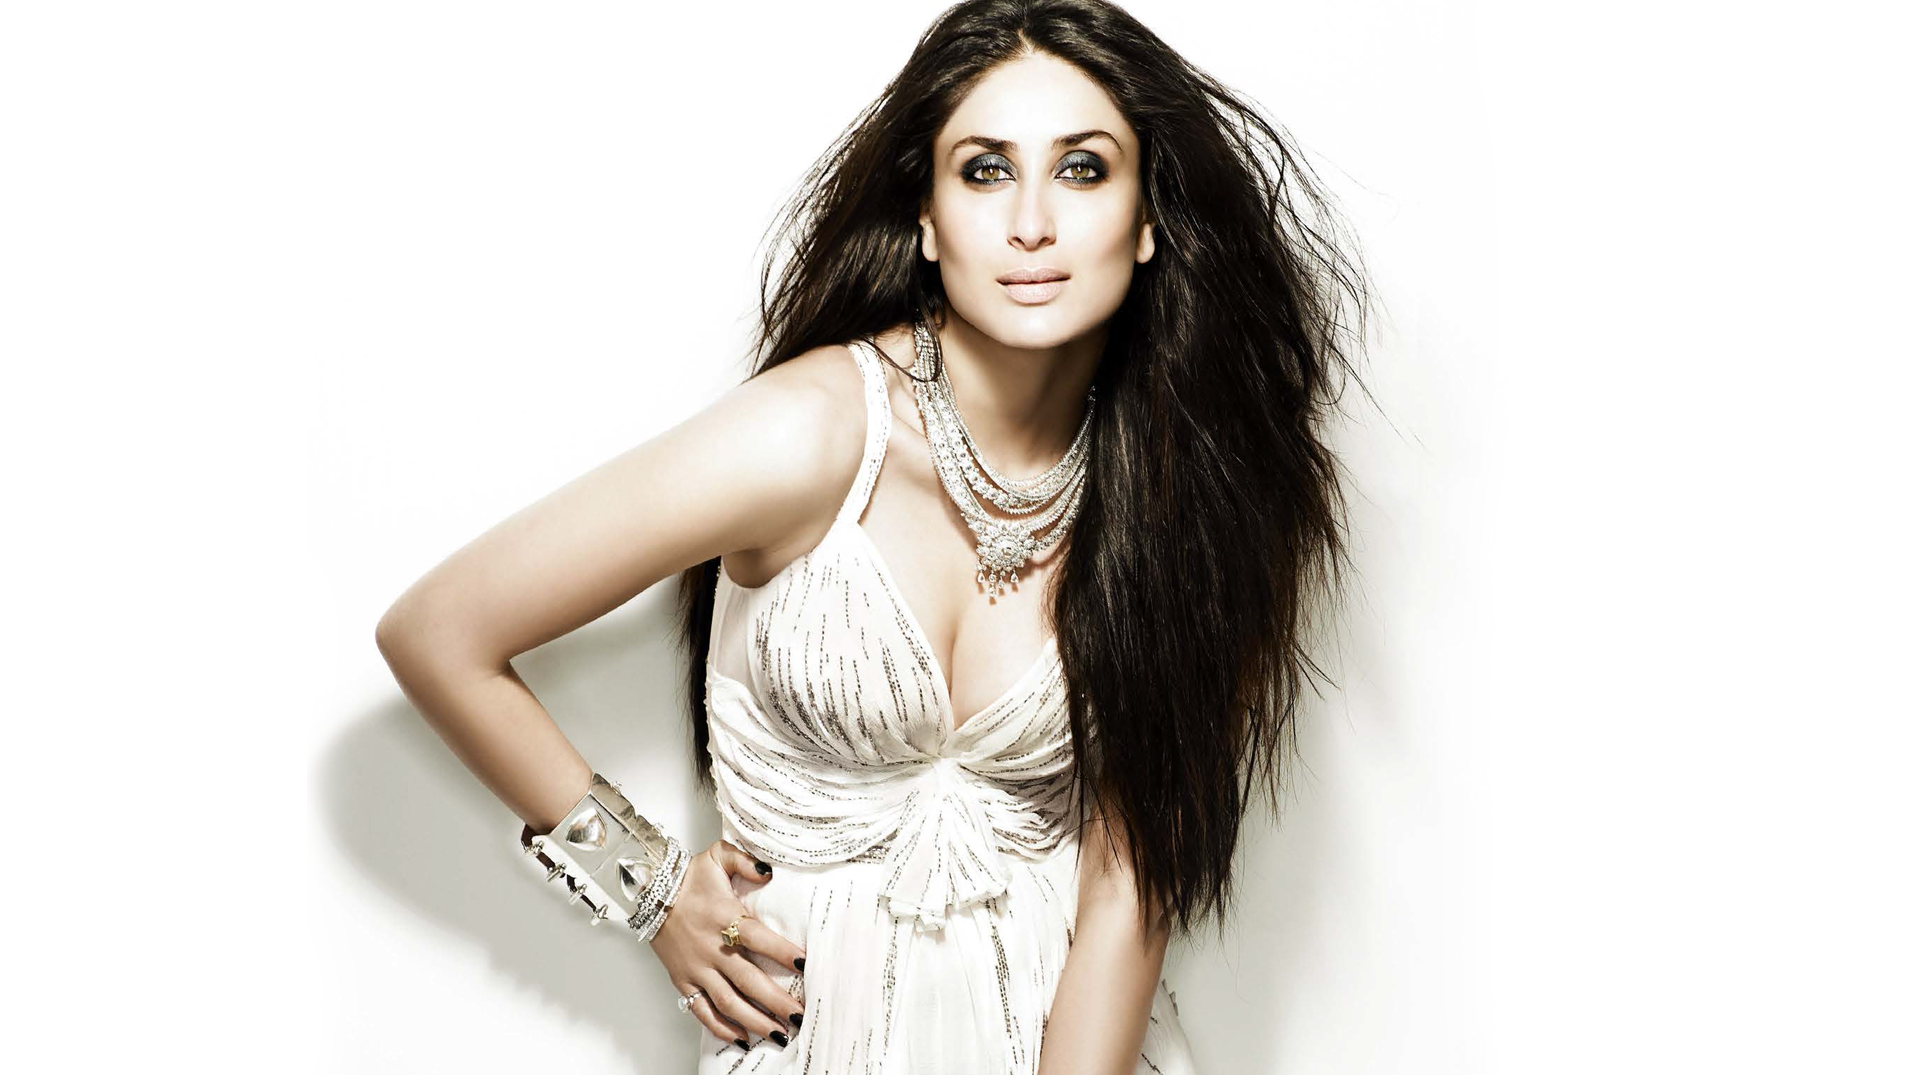 Kareena Kapoor Khan becomes the face of Dabur Amla Hair Oil